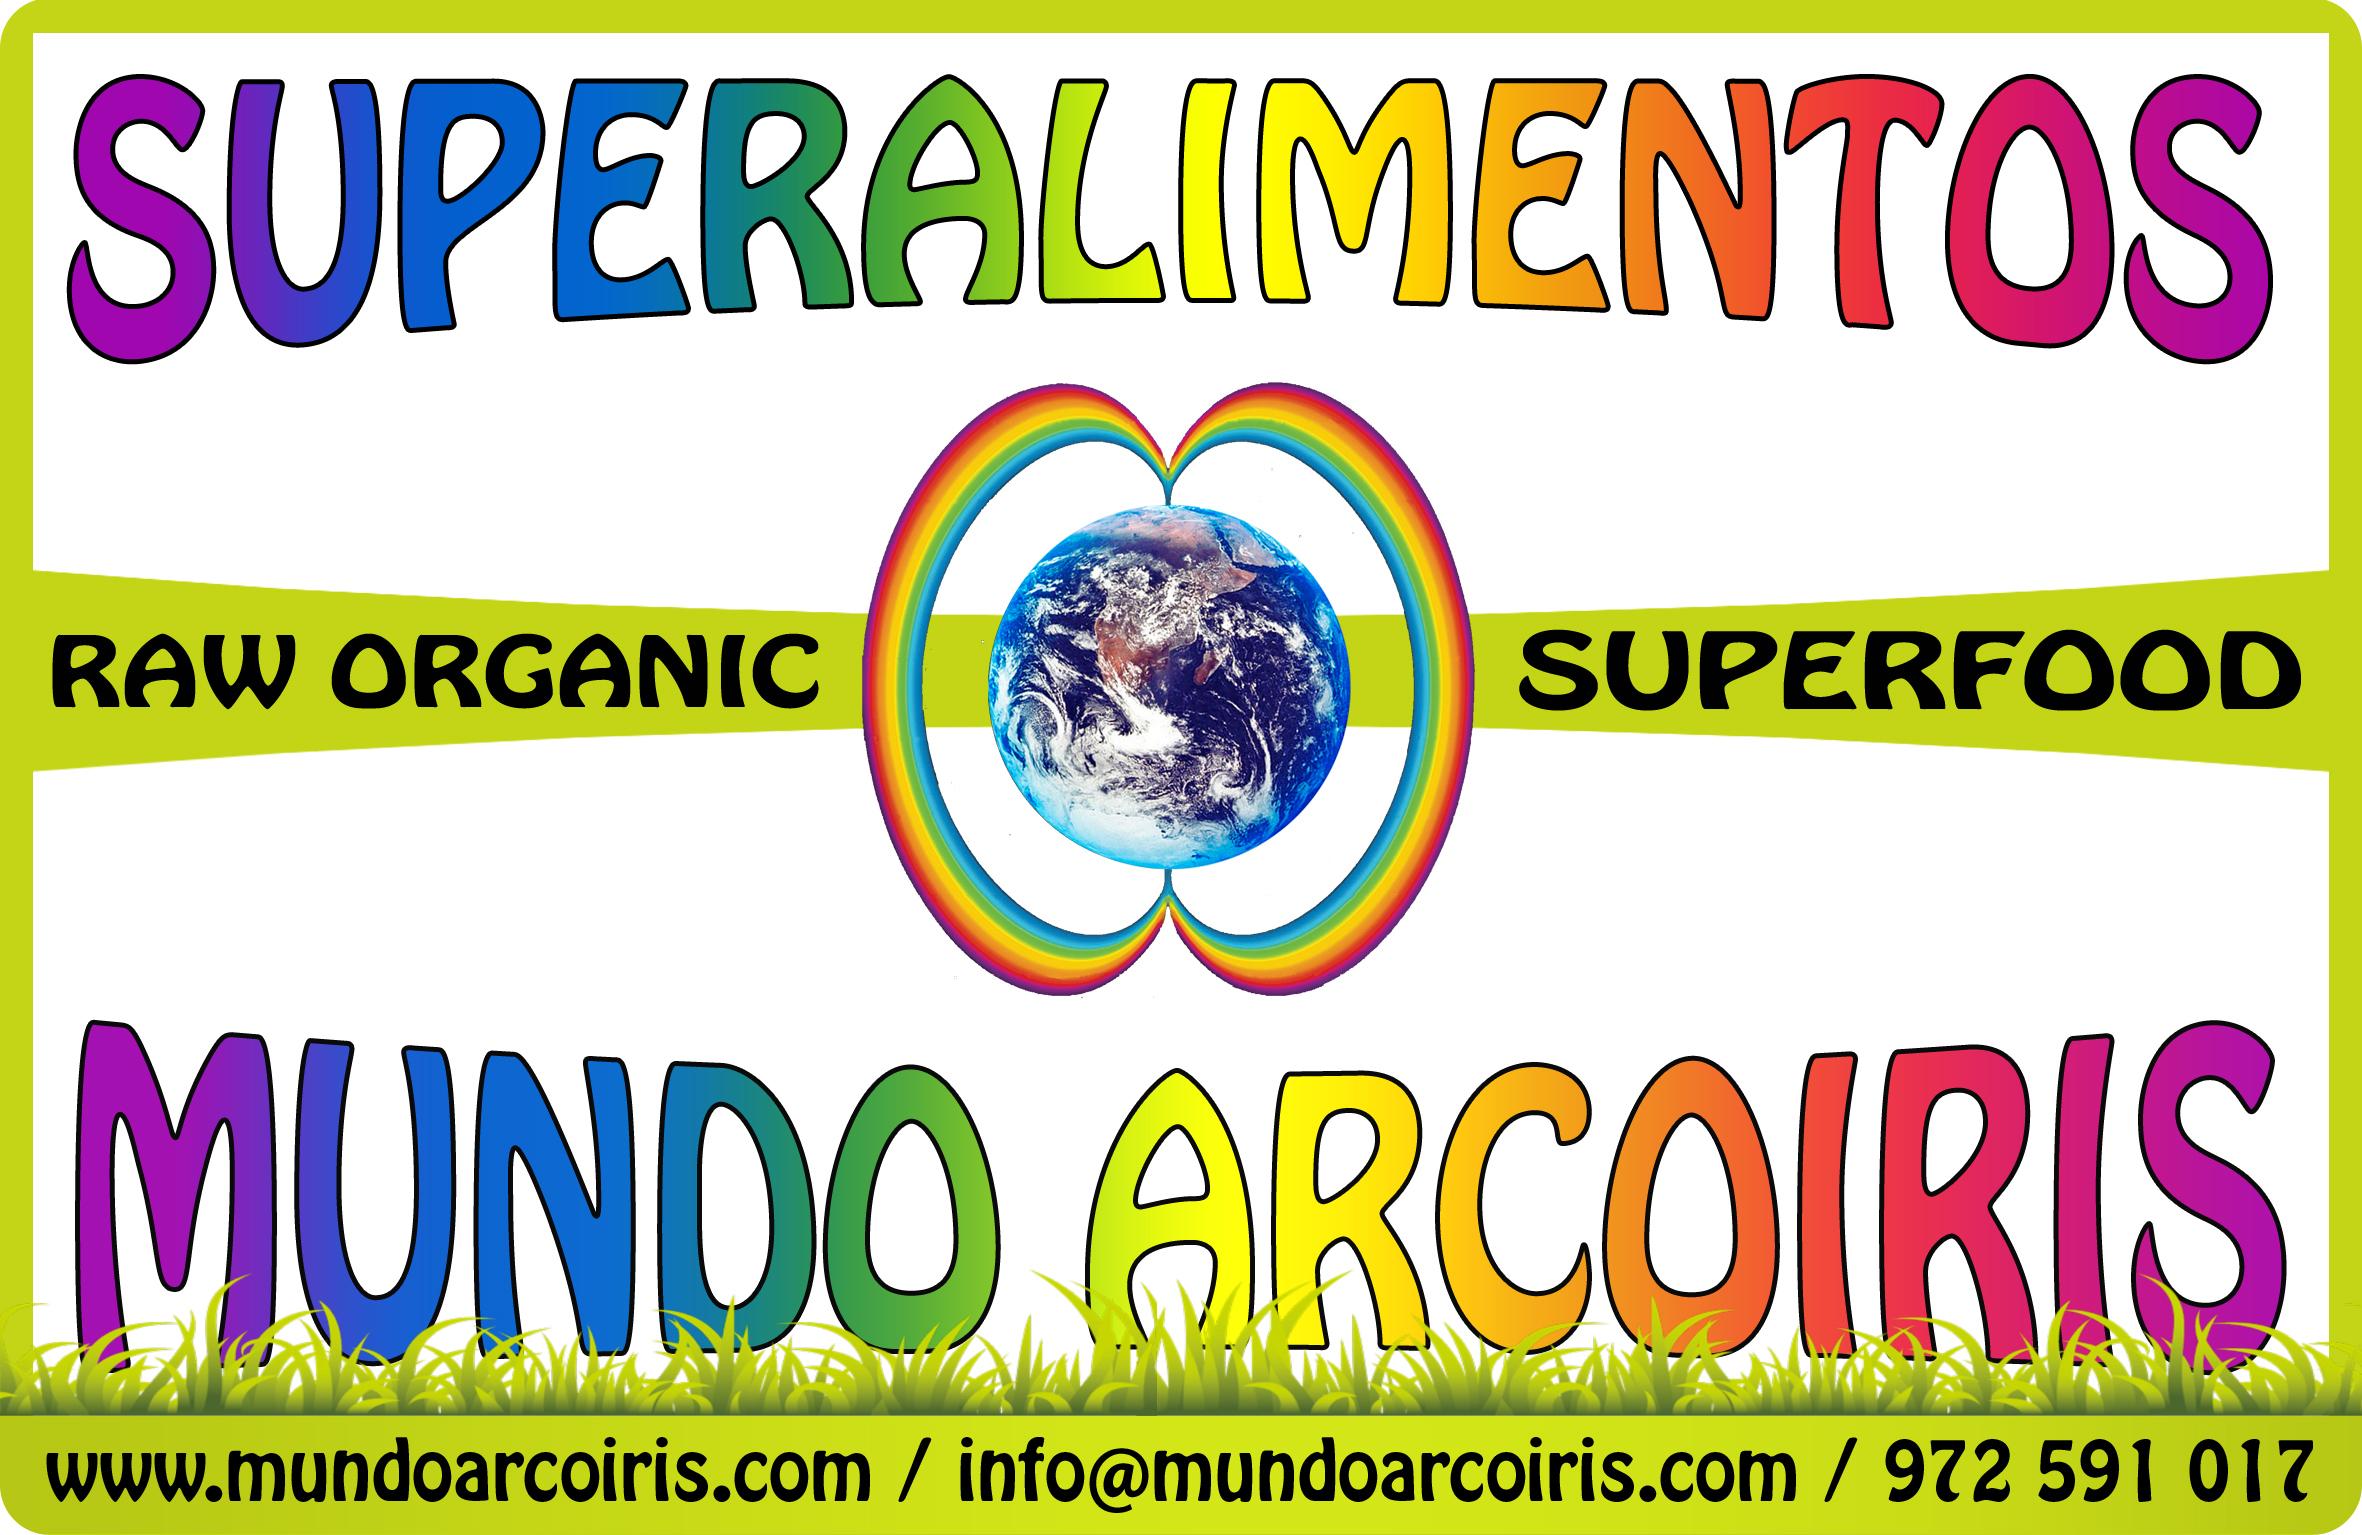 Los superalimentos de 'Mundo Arcoiris'